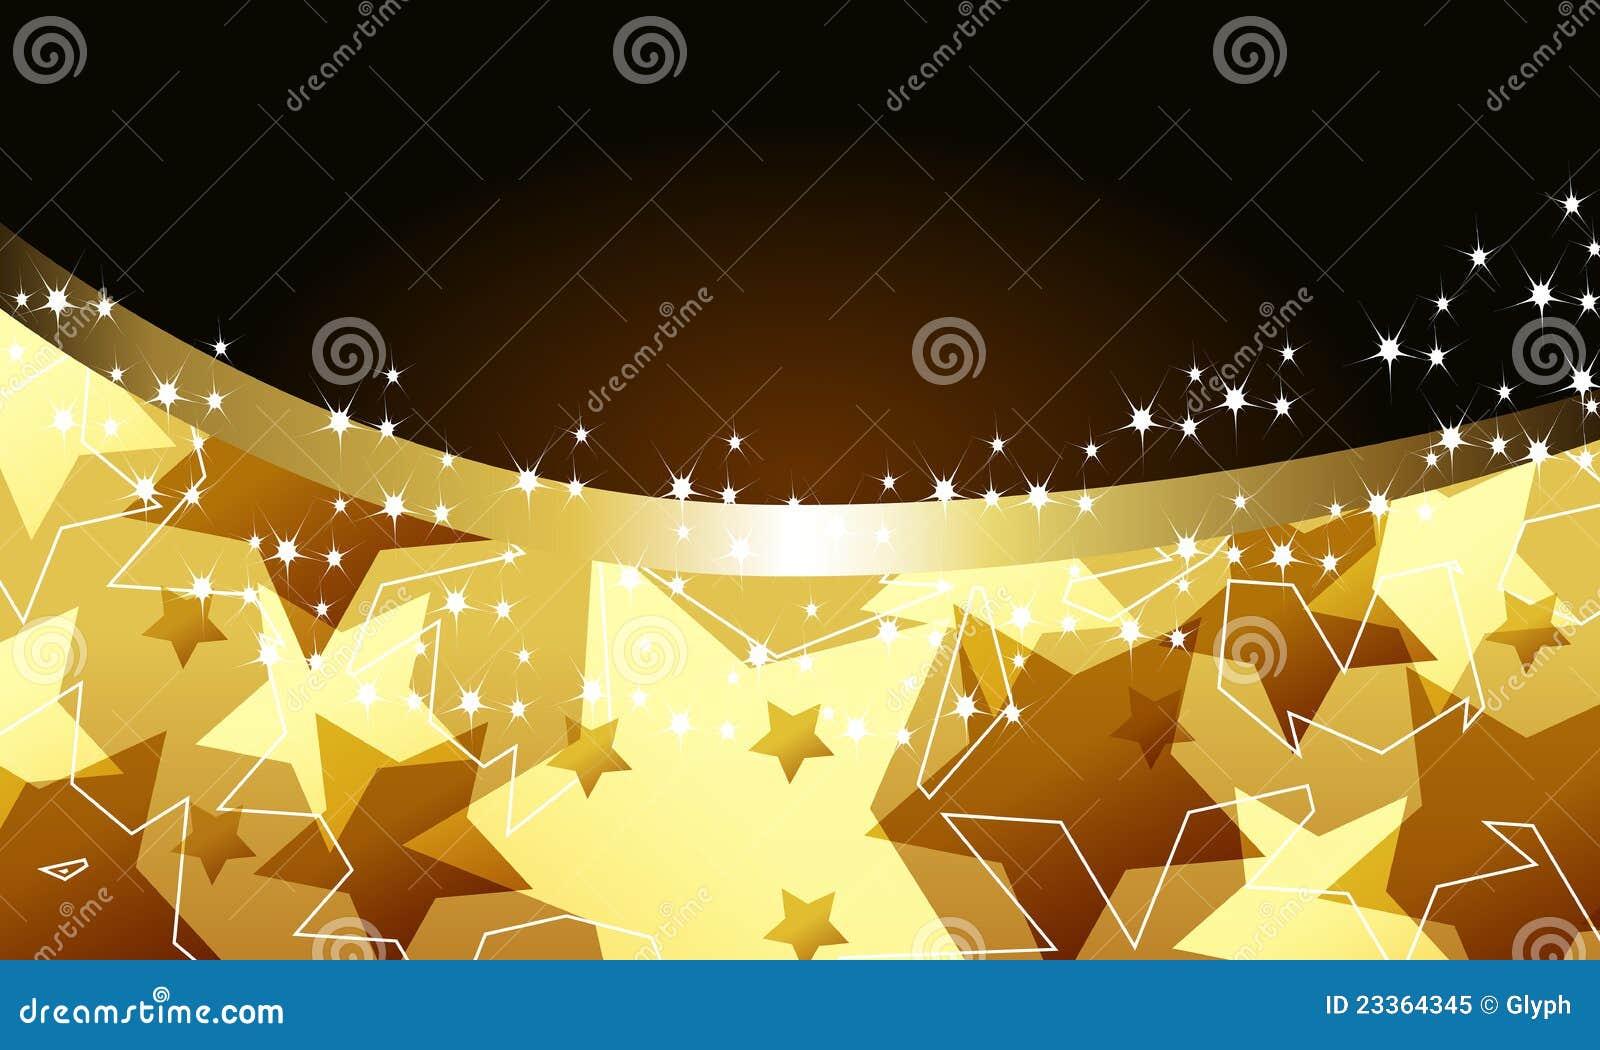 Elegant Birthday Backgrounds : Elegant Party Background With Stars Royalty Free Stock Photo - Image ...